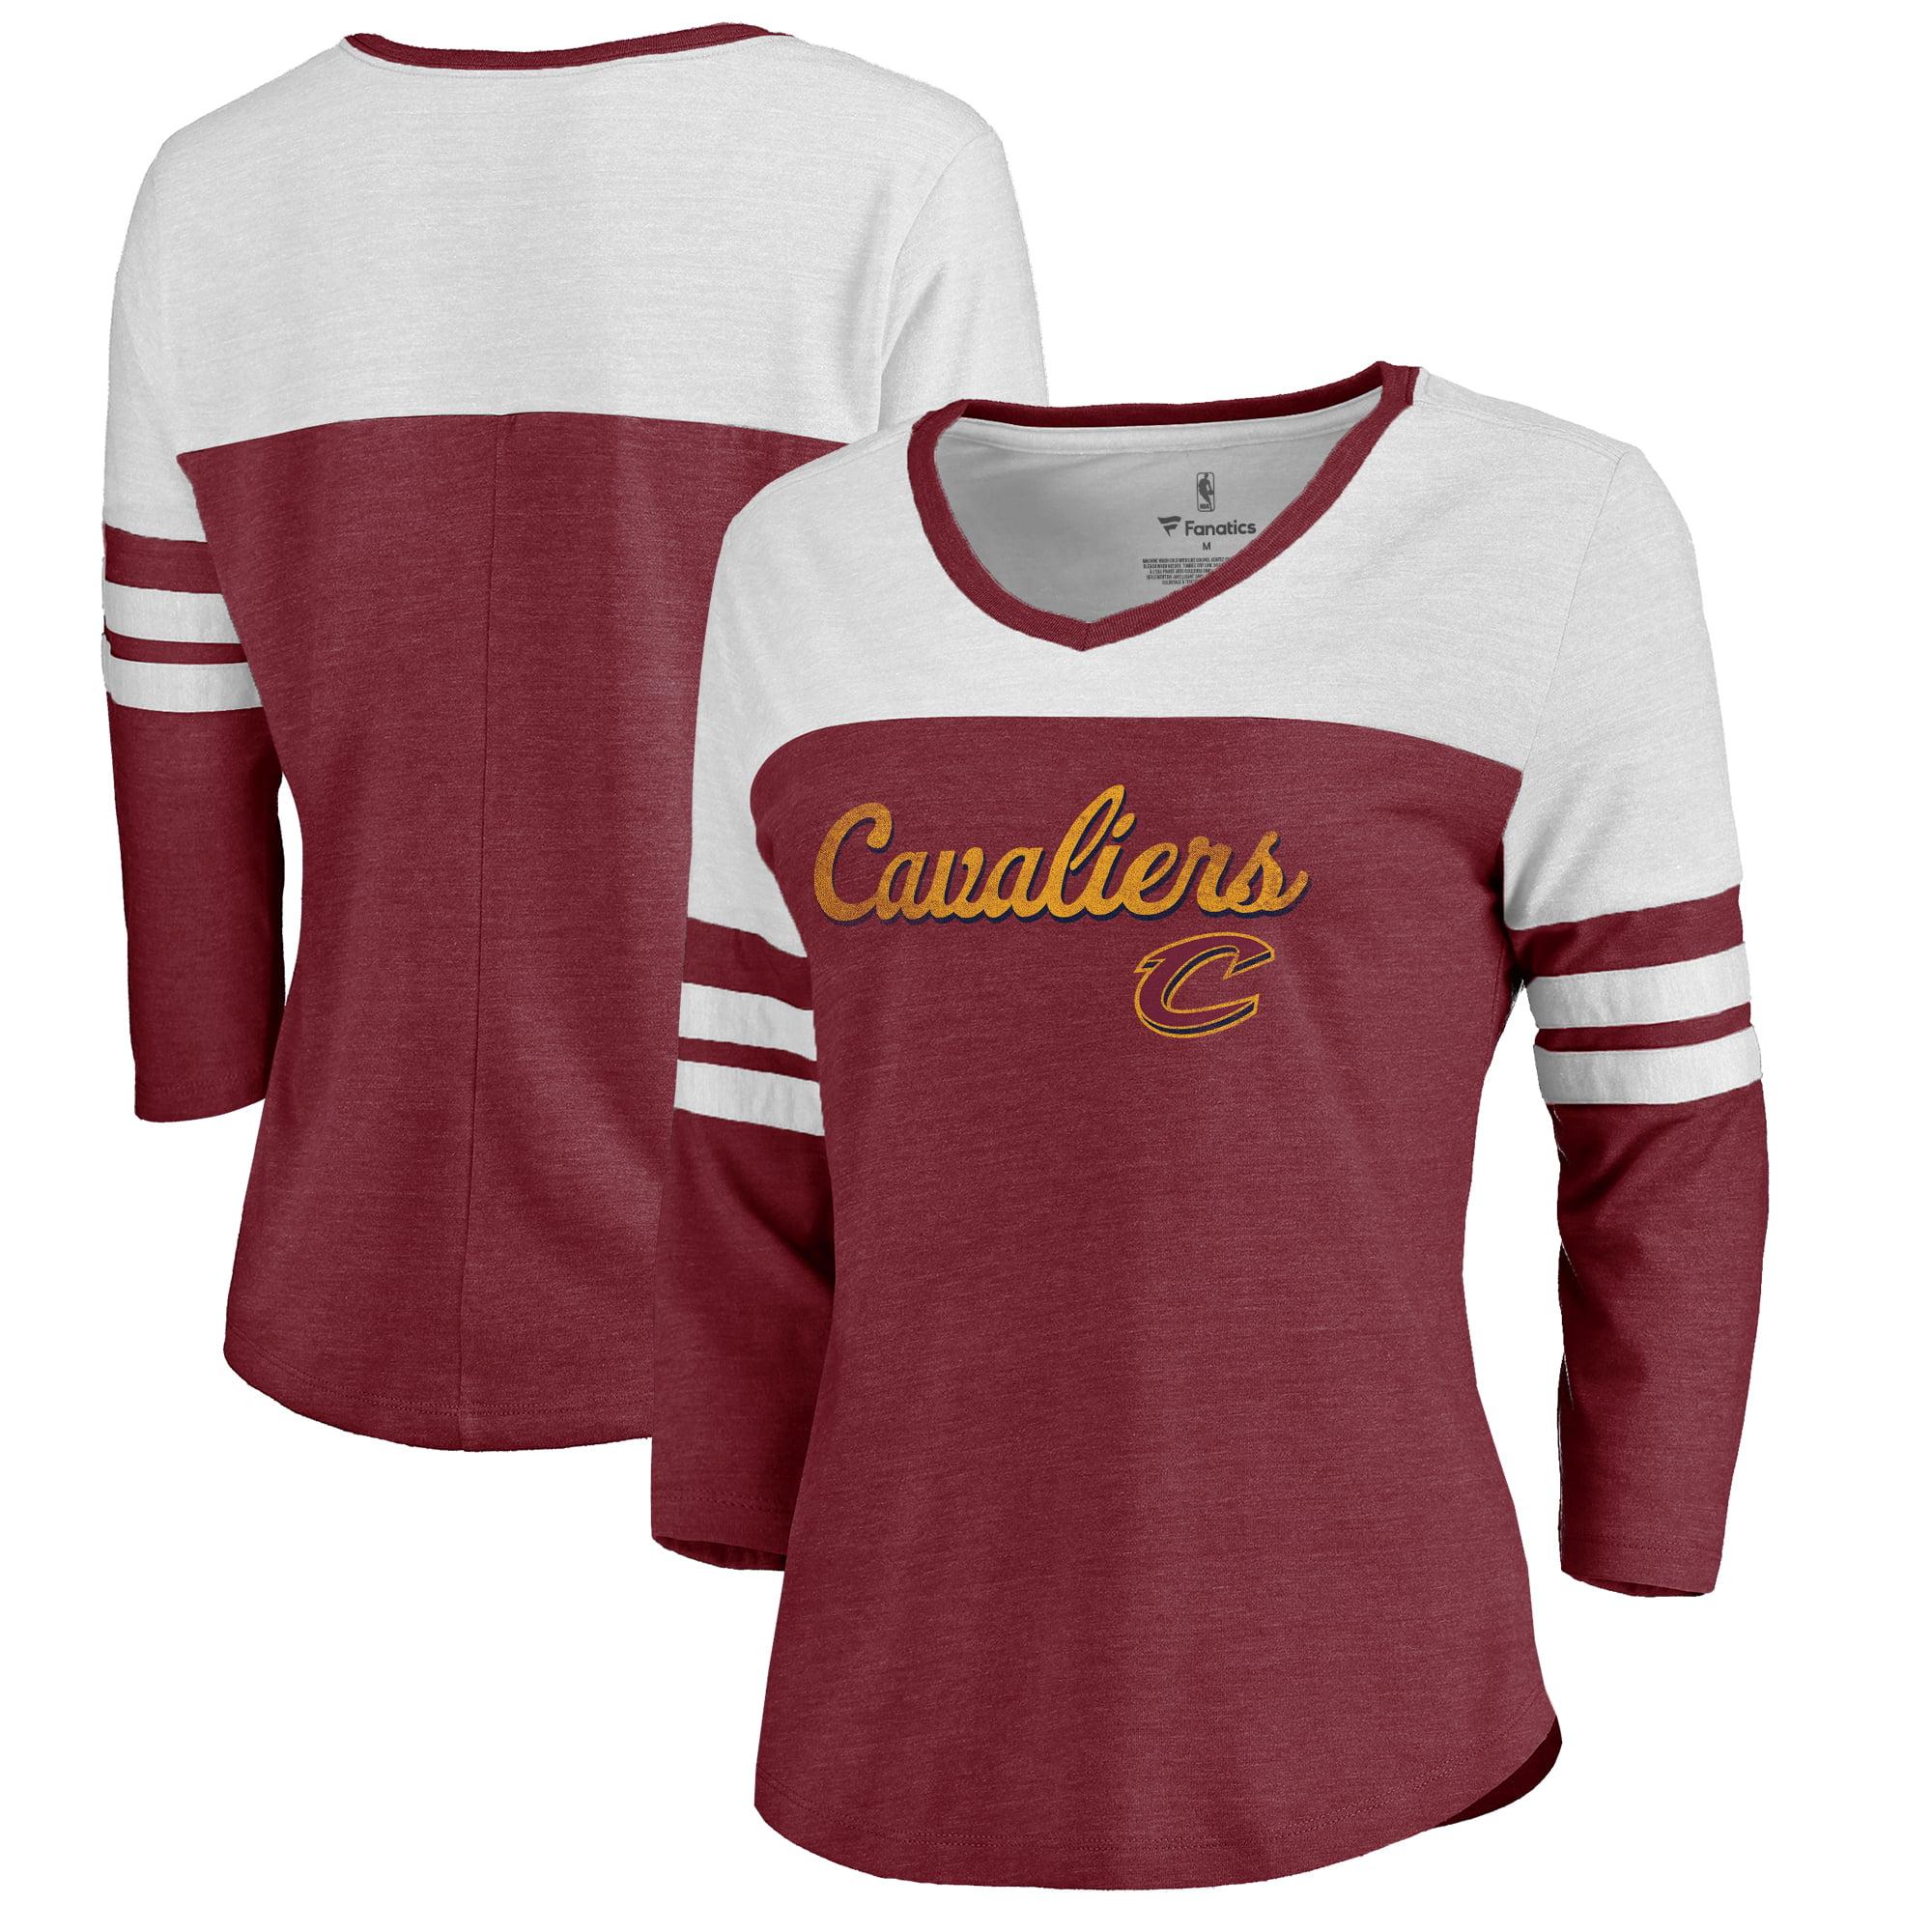 Cleveland Cavaliers Fanatics Branded Women's Rising Script Color Block 3/4 Sleeve Tri-Blend T-Shirt - Wine